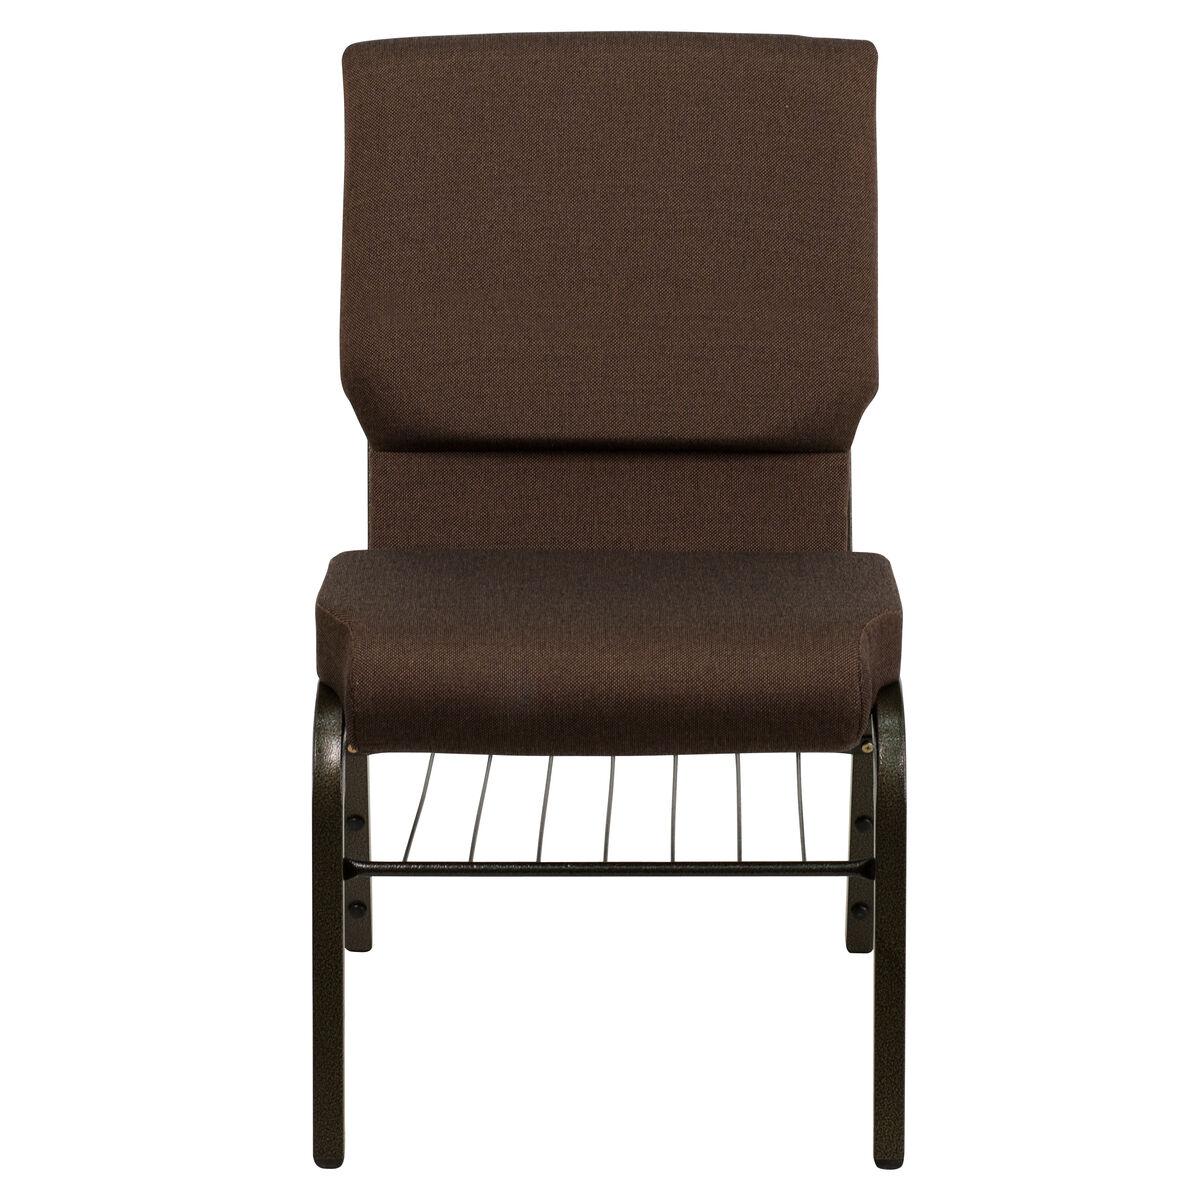 Flash furniture hercules series 18 5 39 39 w church chair in for Furniture 4 less